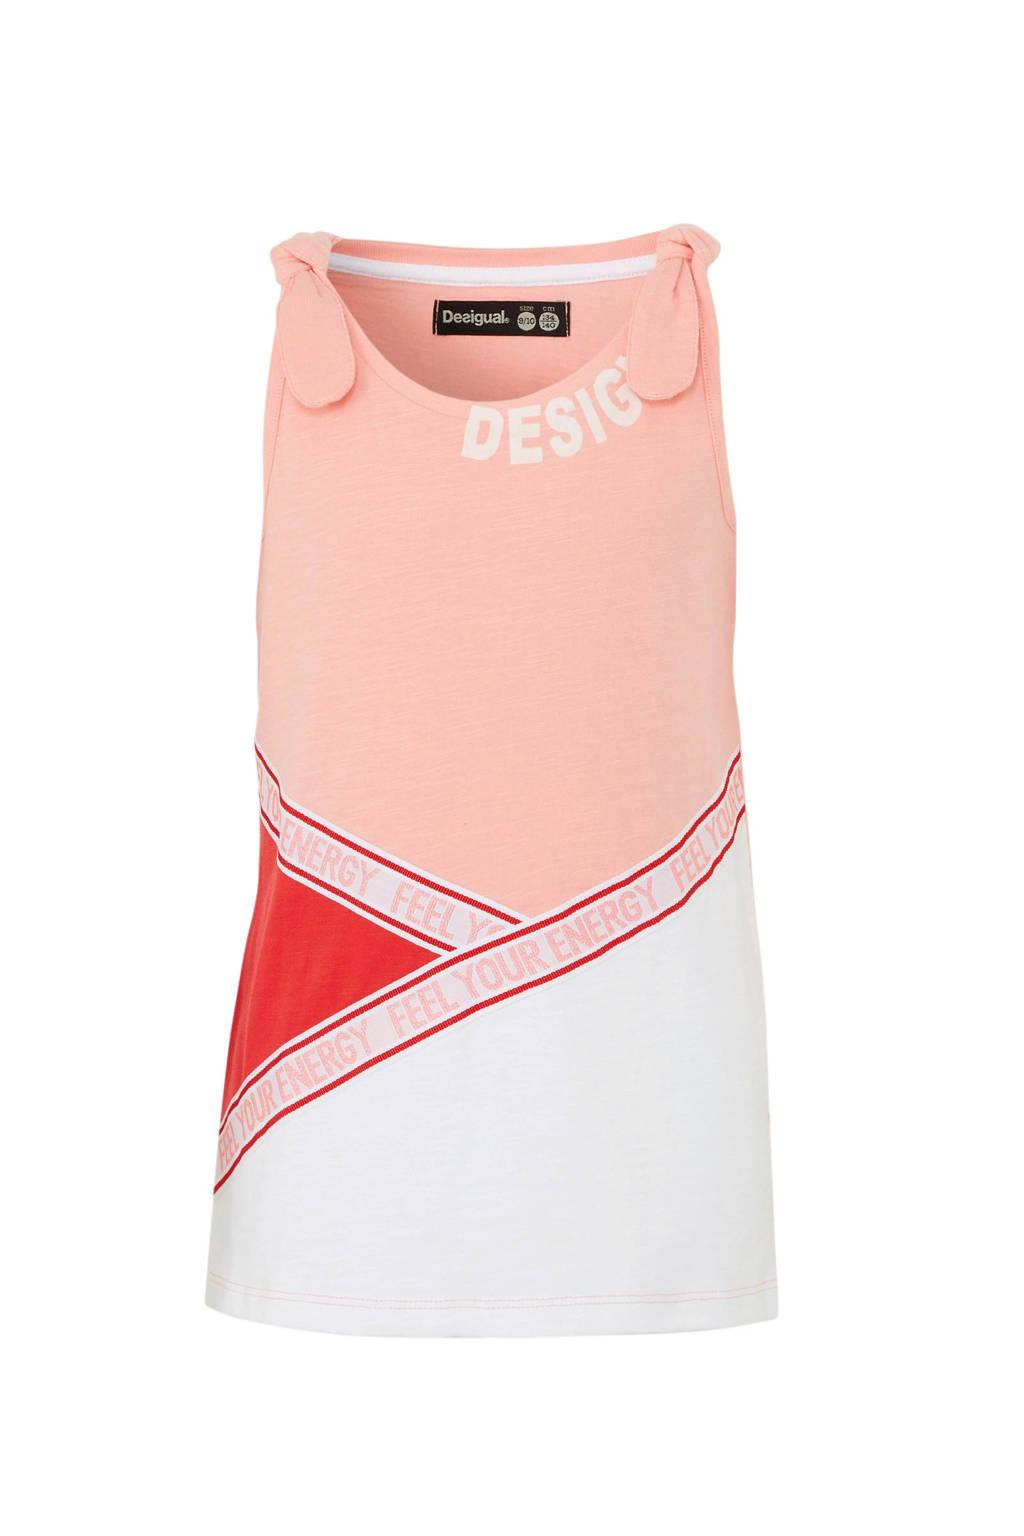 Desigual T-shirt met contrastbies roze/wit/rood, Roze/wit/rood